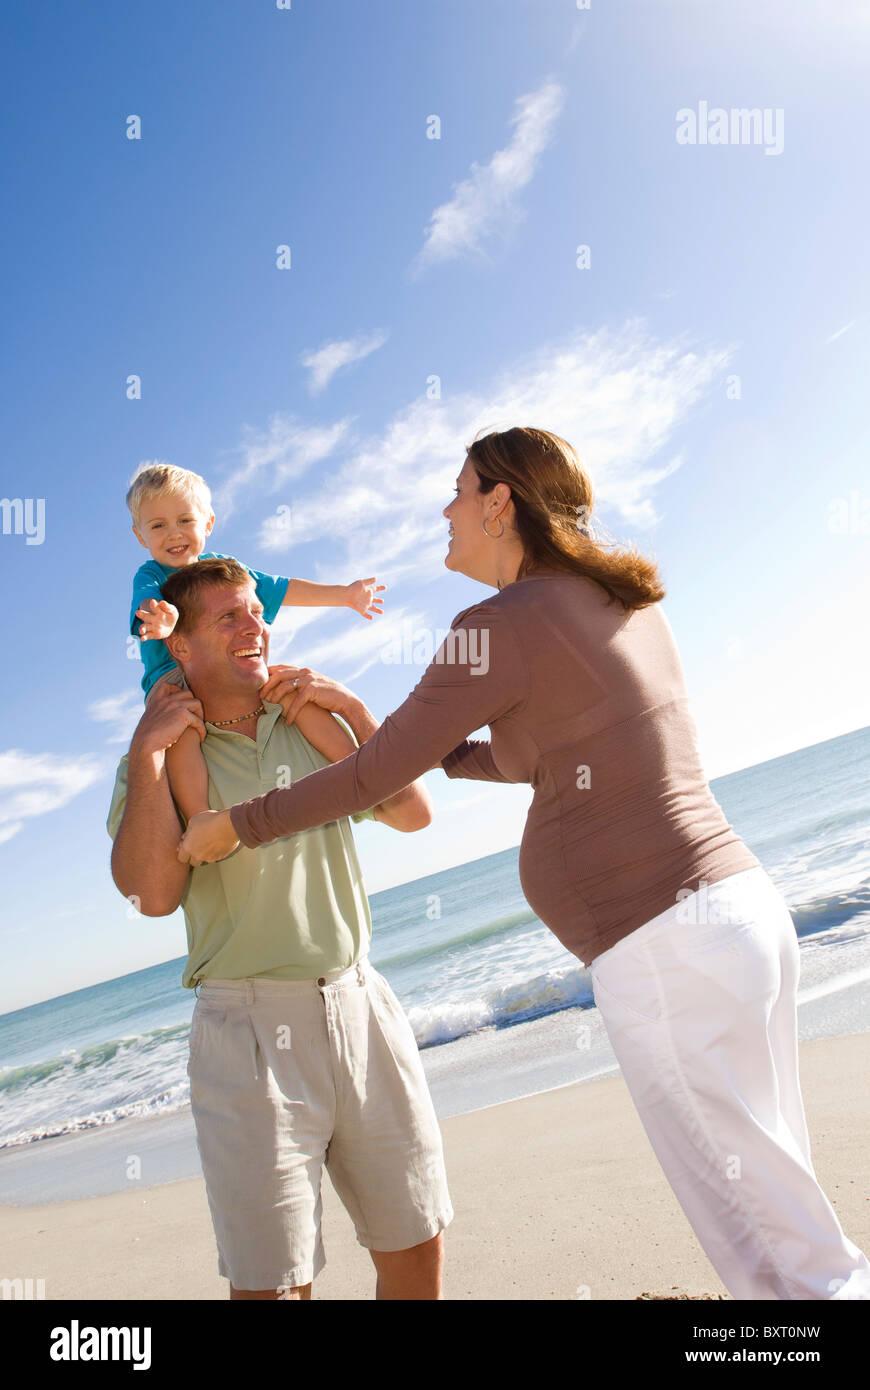 family of 3 at beach Stock Photo